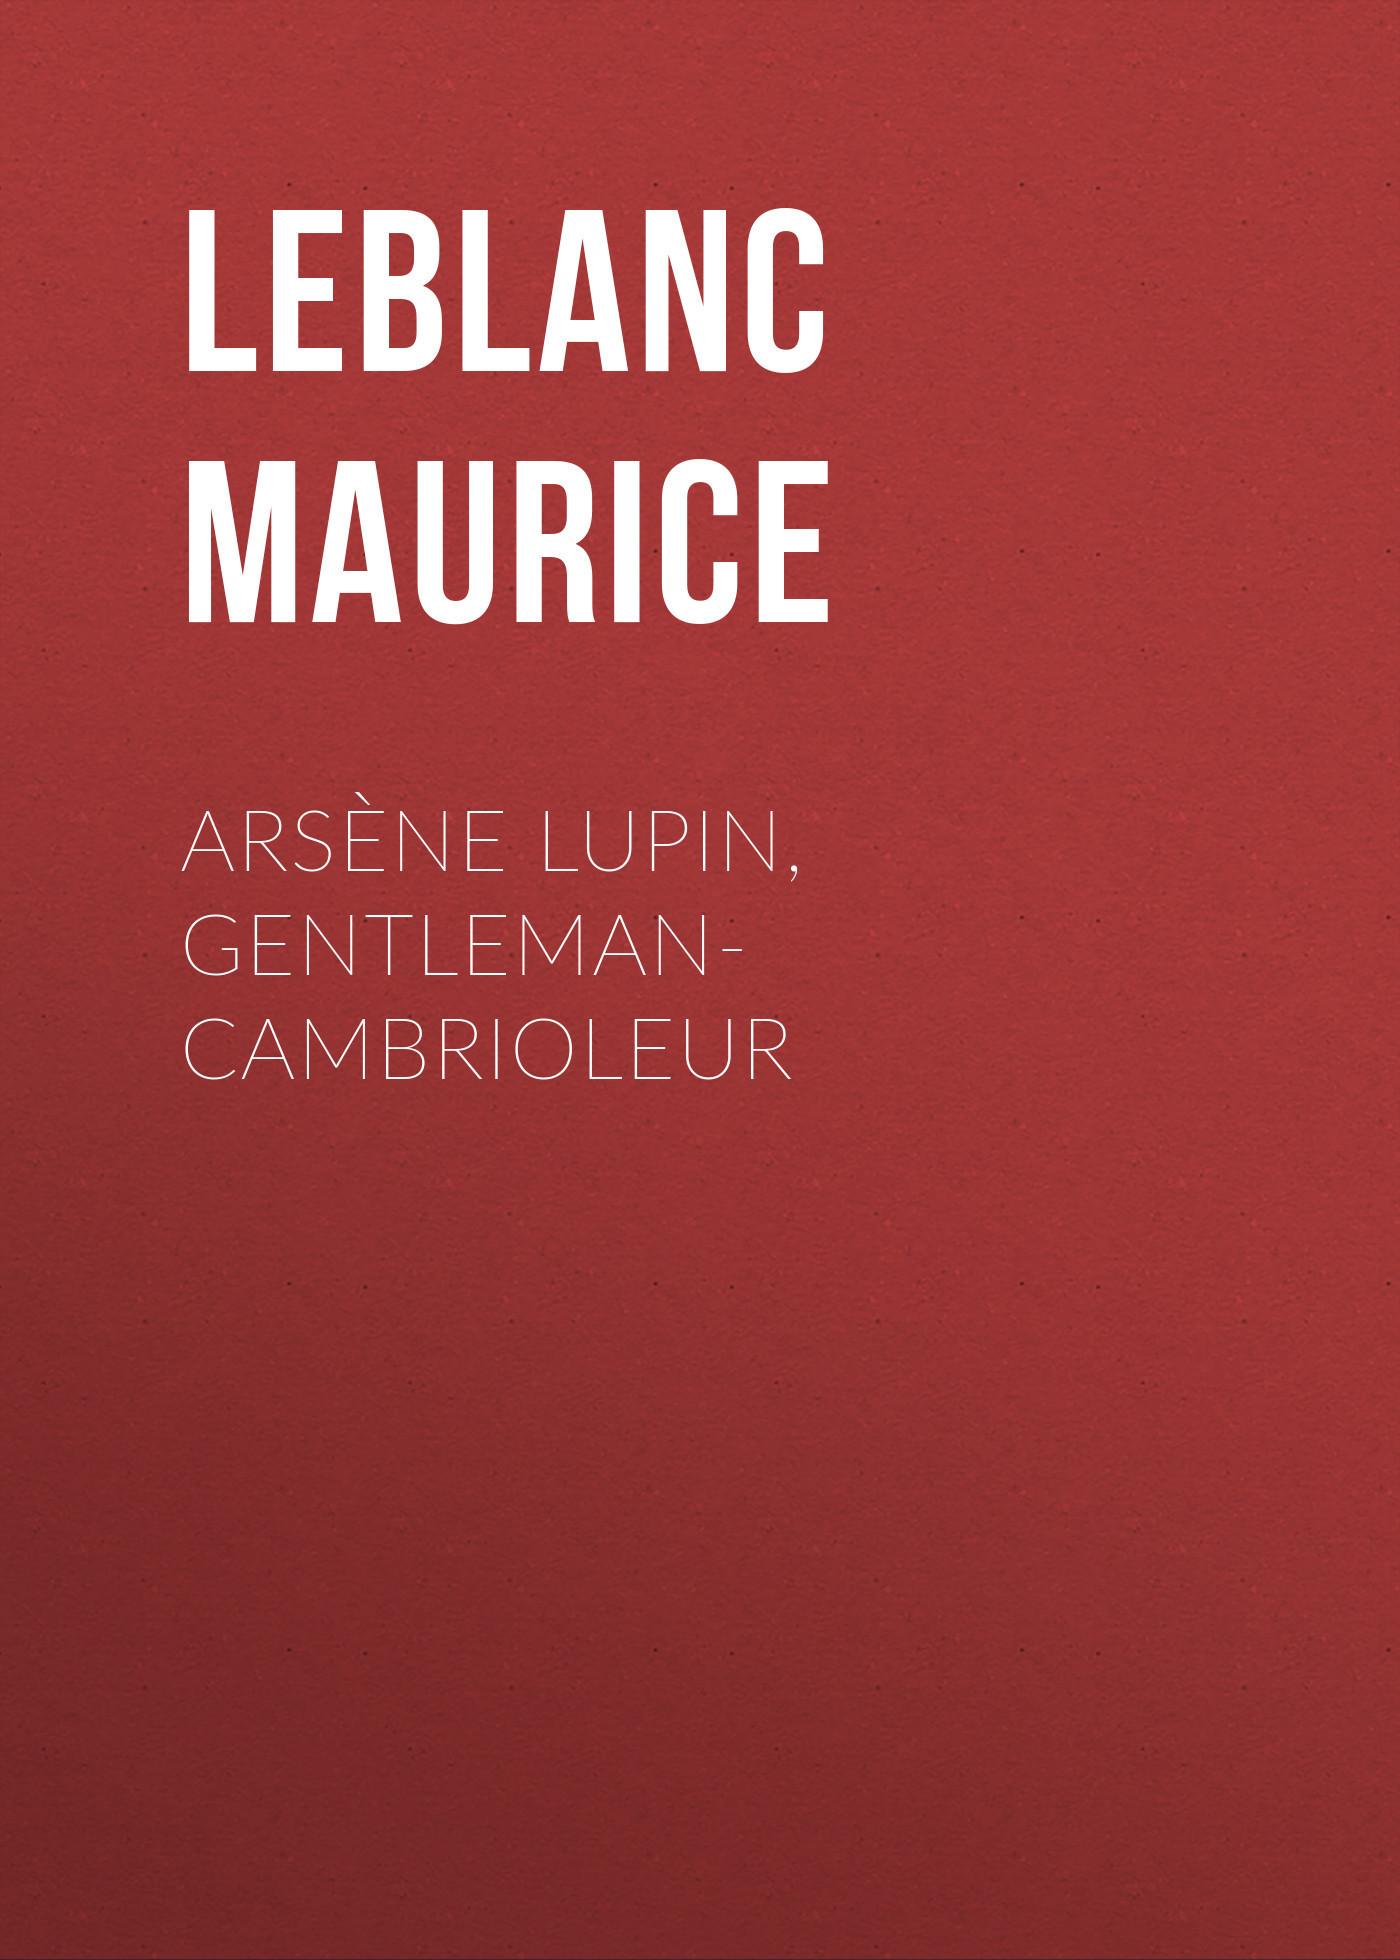 Leblanc Maurice Arsène Lupin, gentleman-cambrioleur leblanc maurice the confessions of arsène lupin